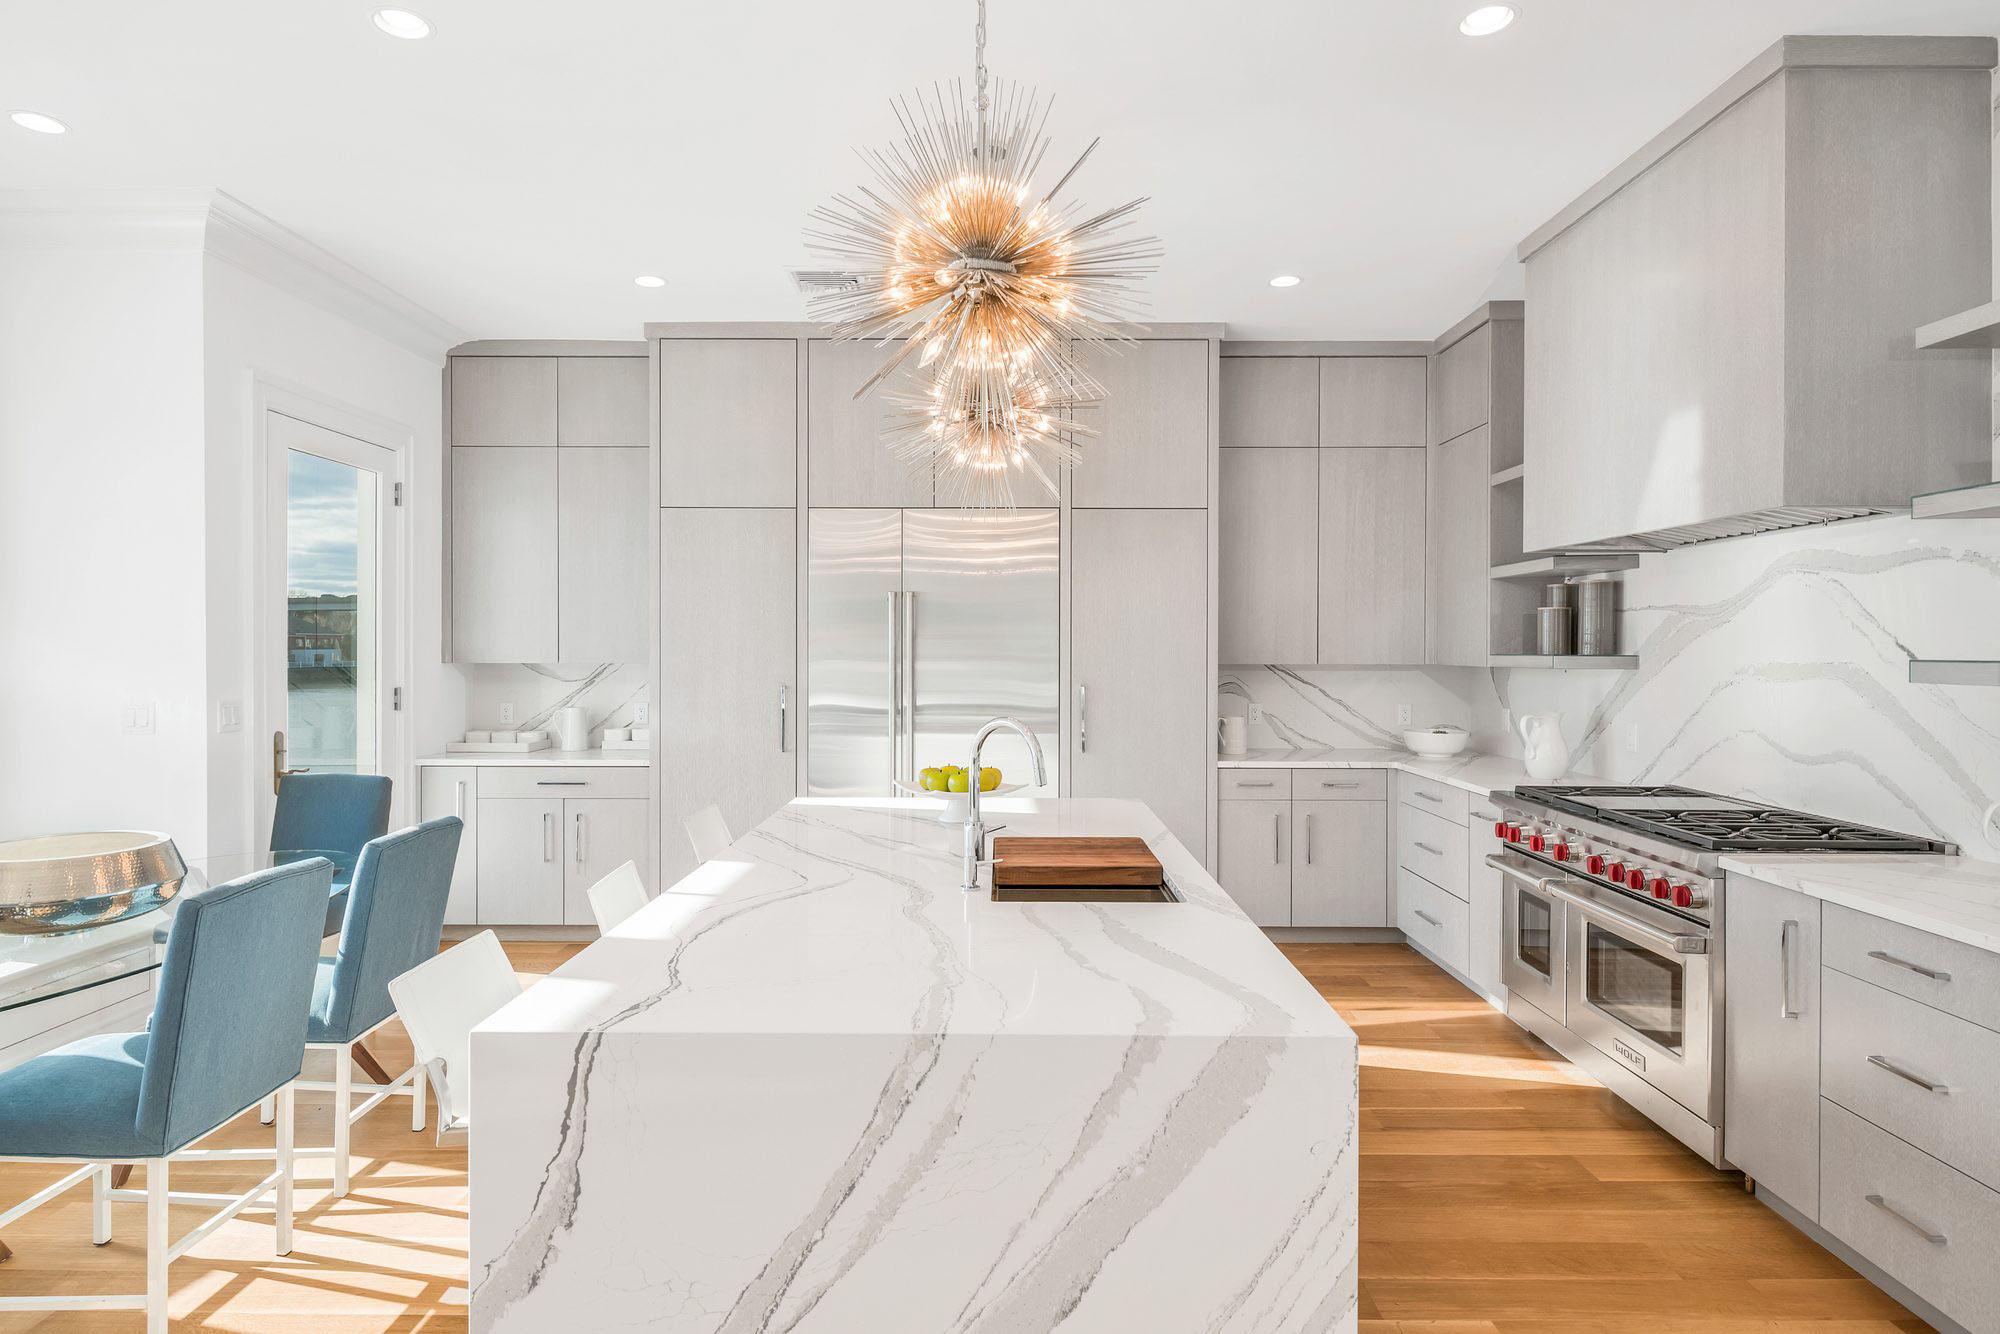 modern kitchen, marble quartz countertops, solid slab backsplash, cool pink pendant lighting, wolf stove red knobs